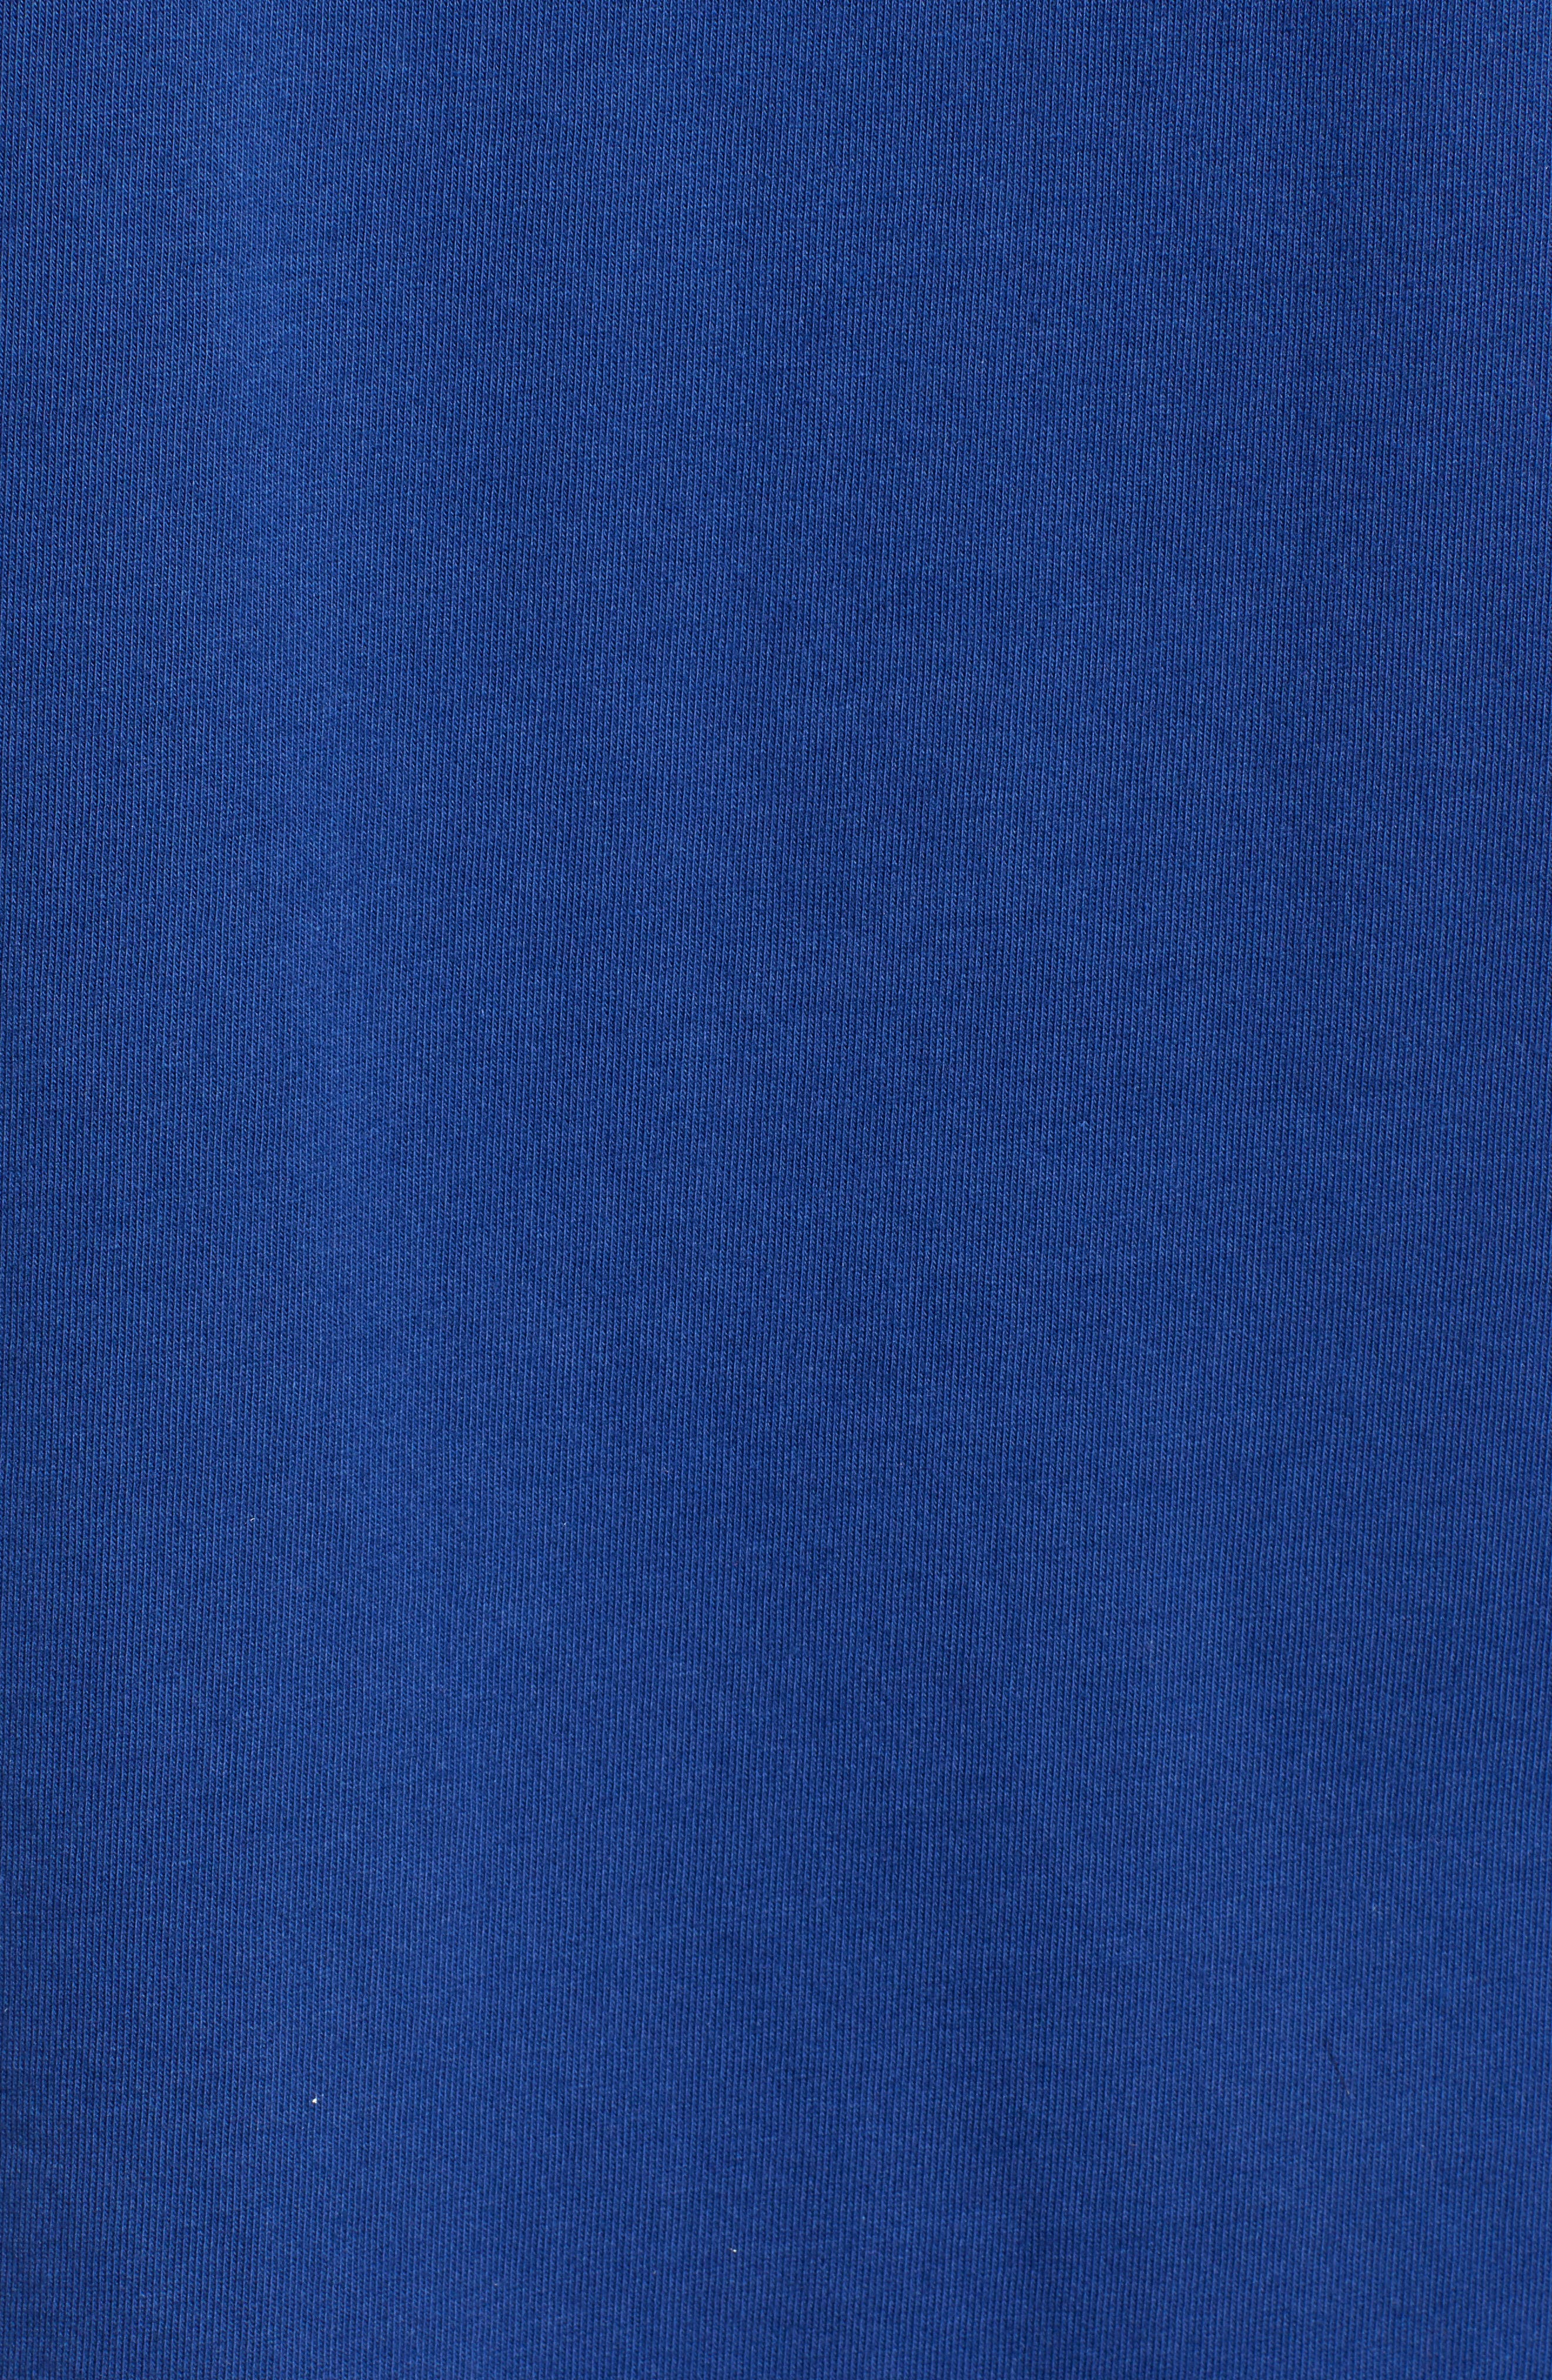 U.S. Tradition Pocket T-Shirt,                             Alternate thumbnail 5, color,                             400